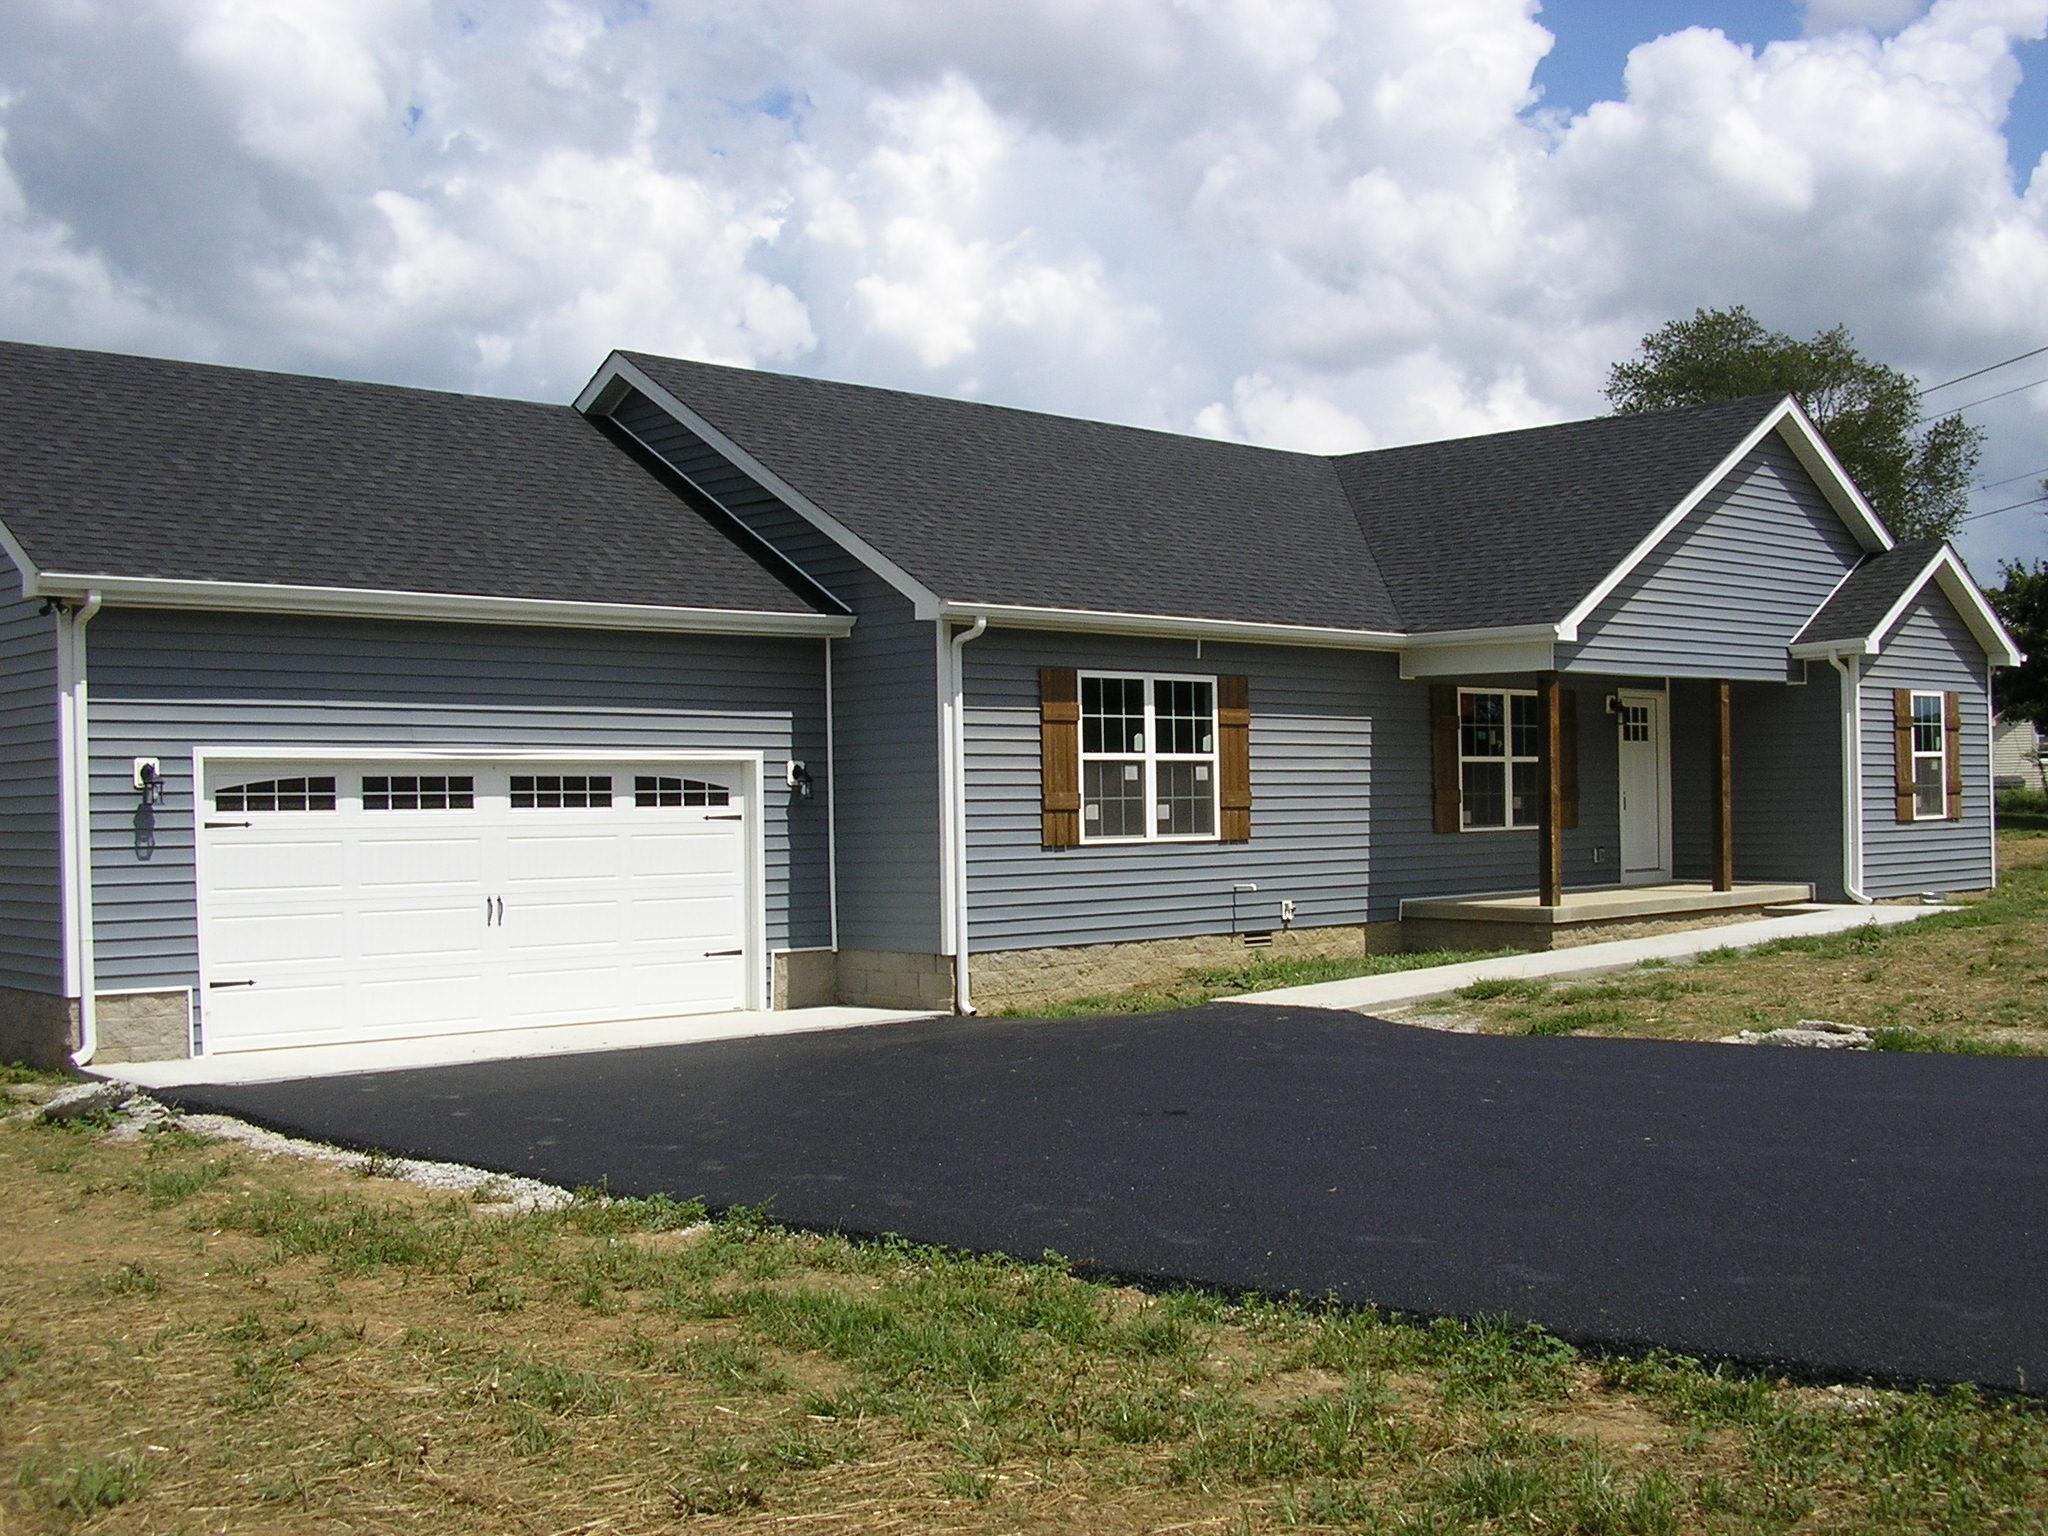 80 Summers Road, Auburn, KY 42206